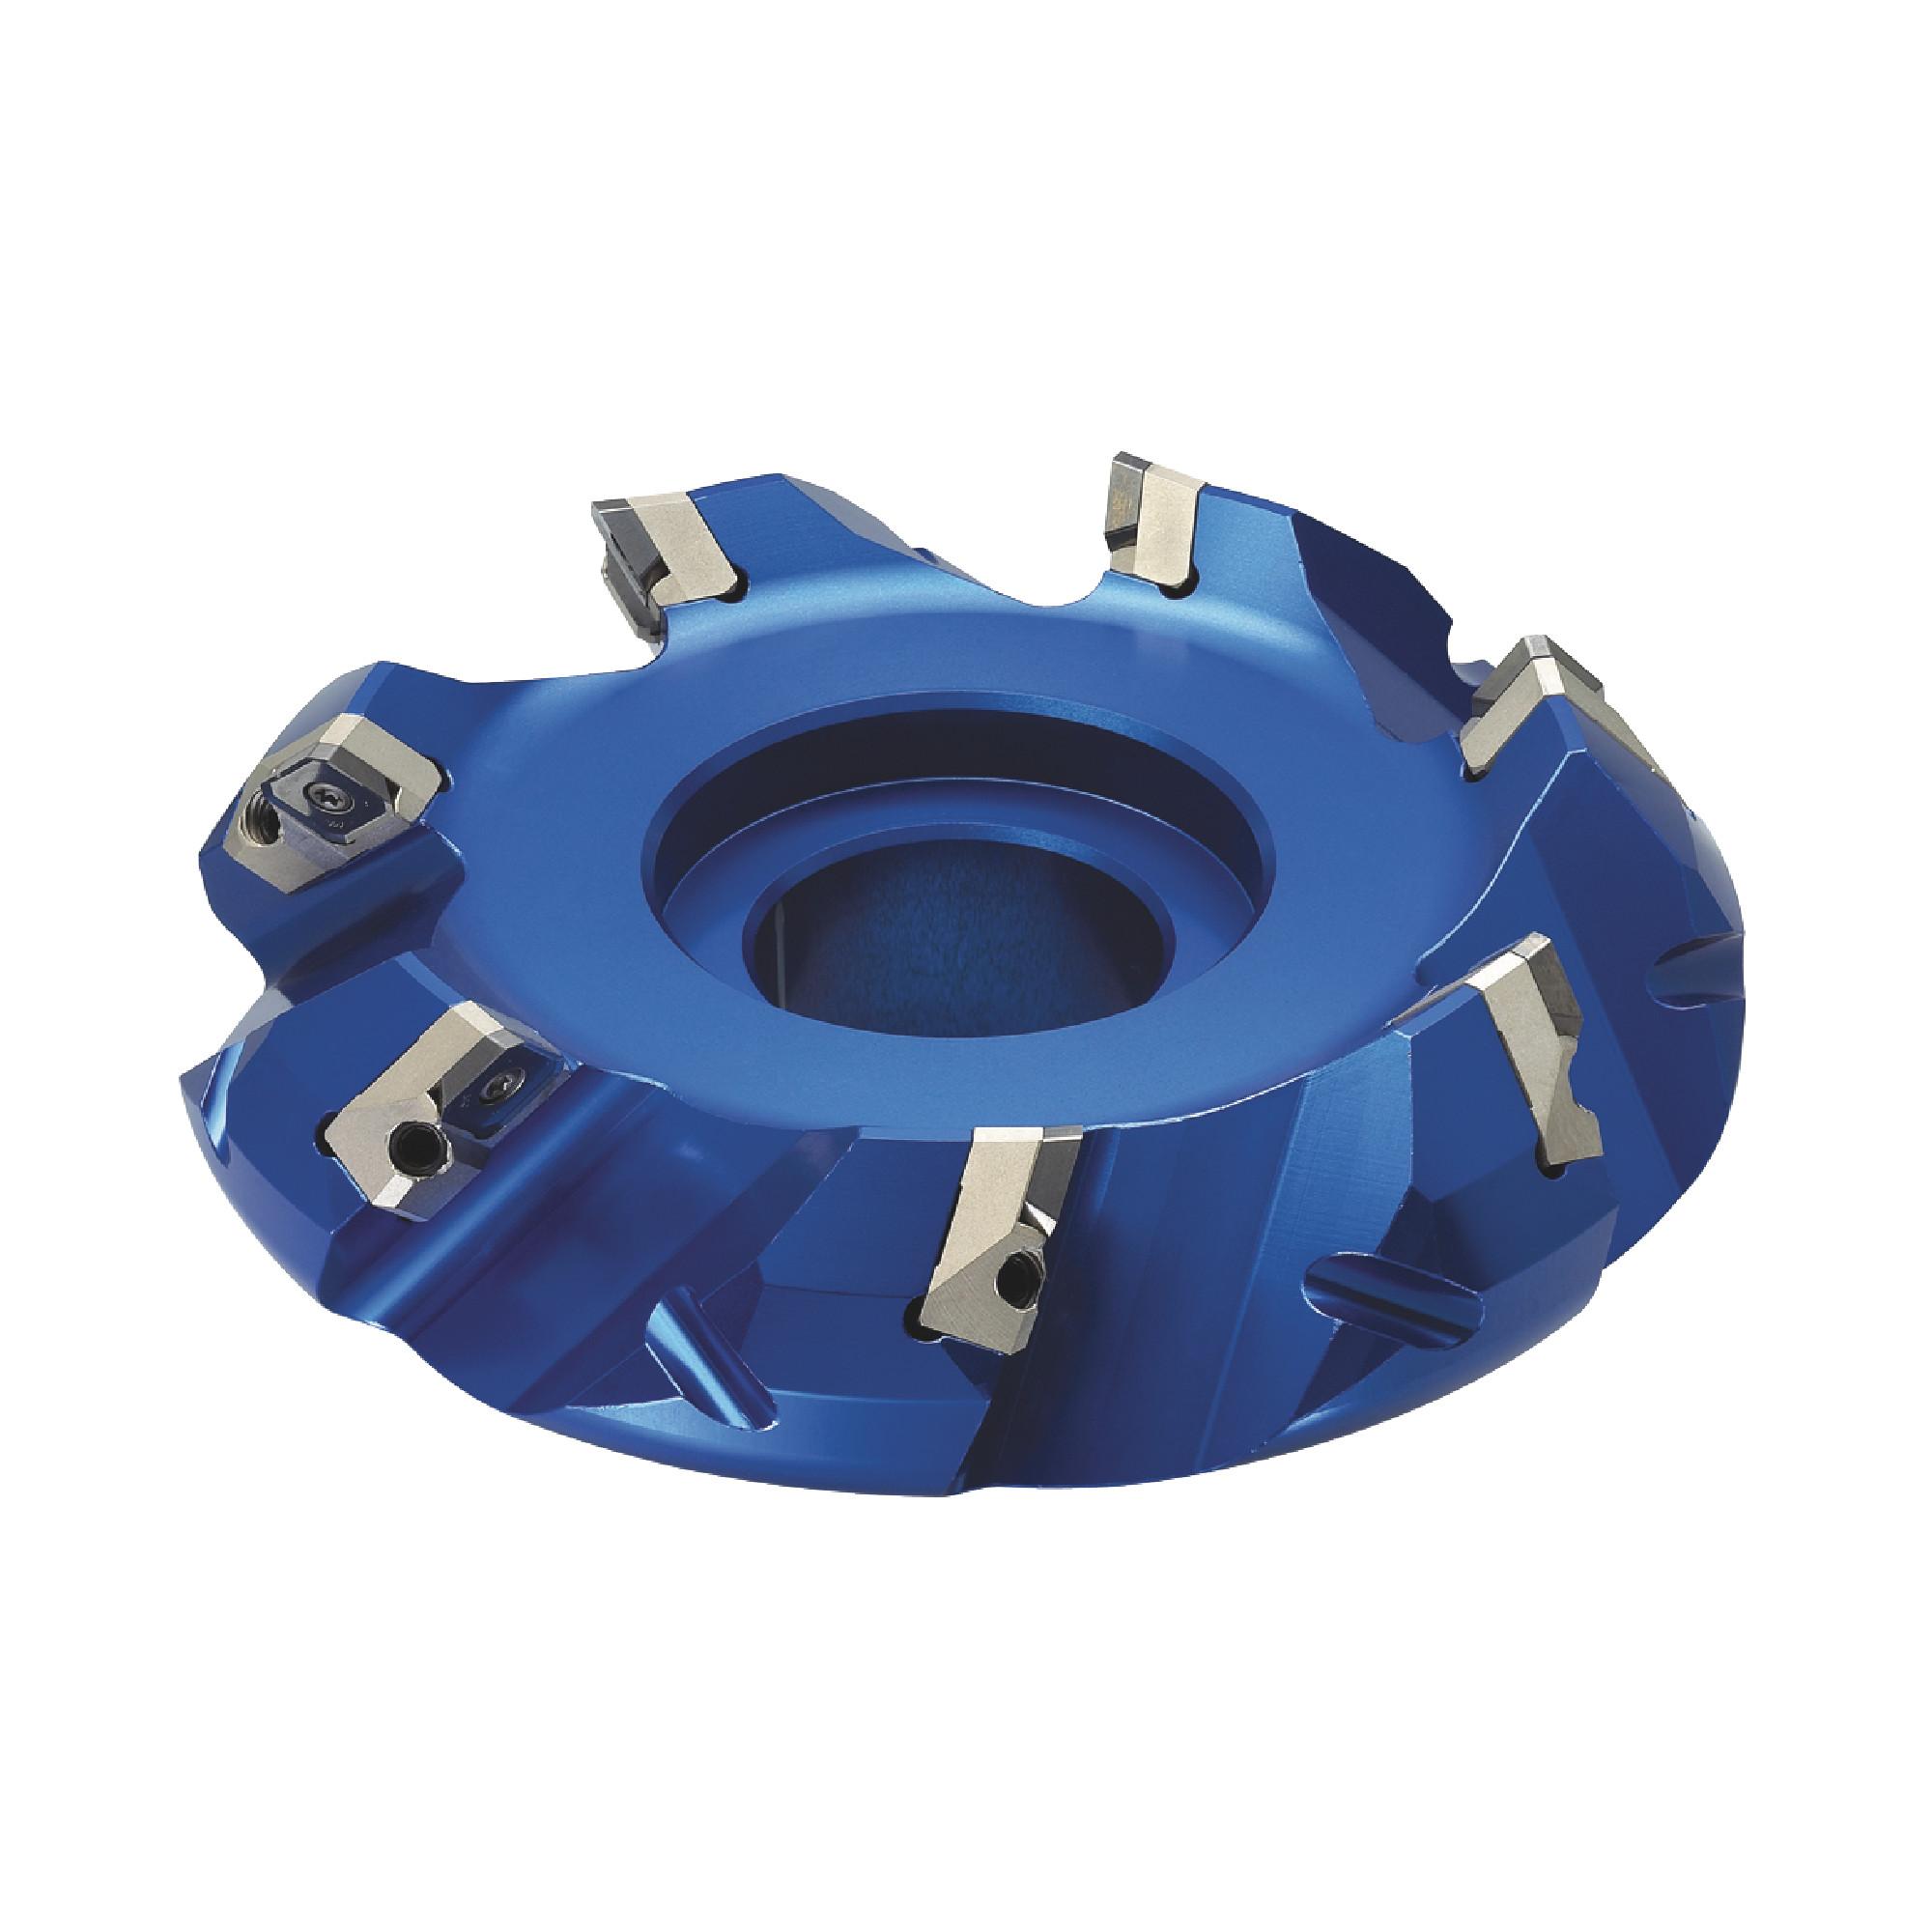 "KORLOY - 2.500"" - 45° Face Mill Set / Includes: (1) FMACA4250R-A (2.5"" ø) & (10) SEET14M4AGFN-MA H01 Polishe"